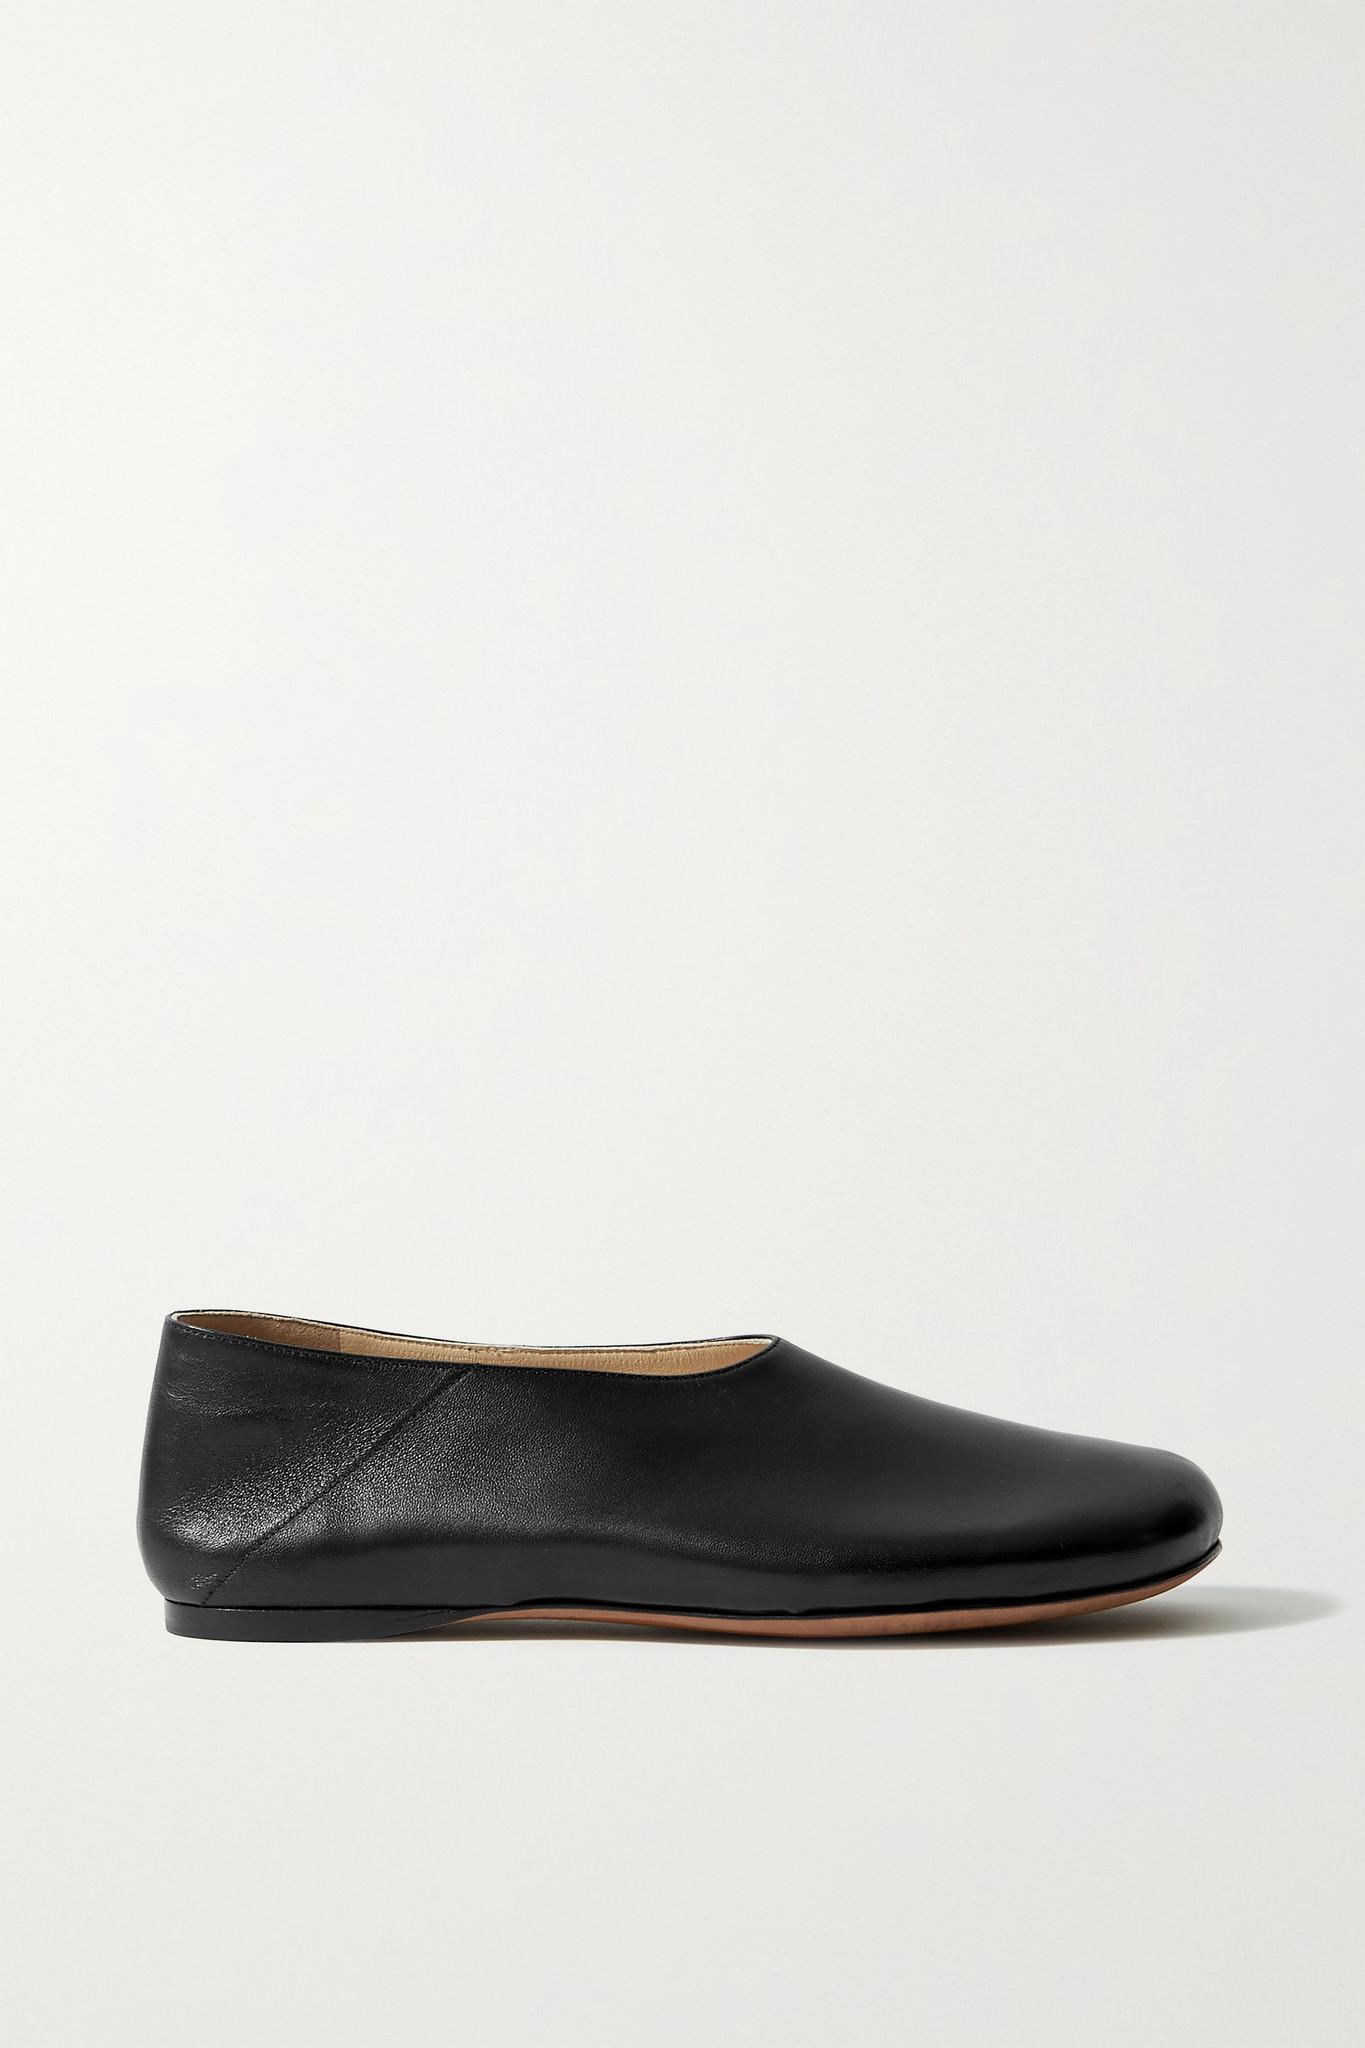 PROENZA SCHOULER - Rondo Leather Ballet Flats - Black - IT39